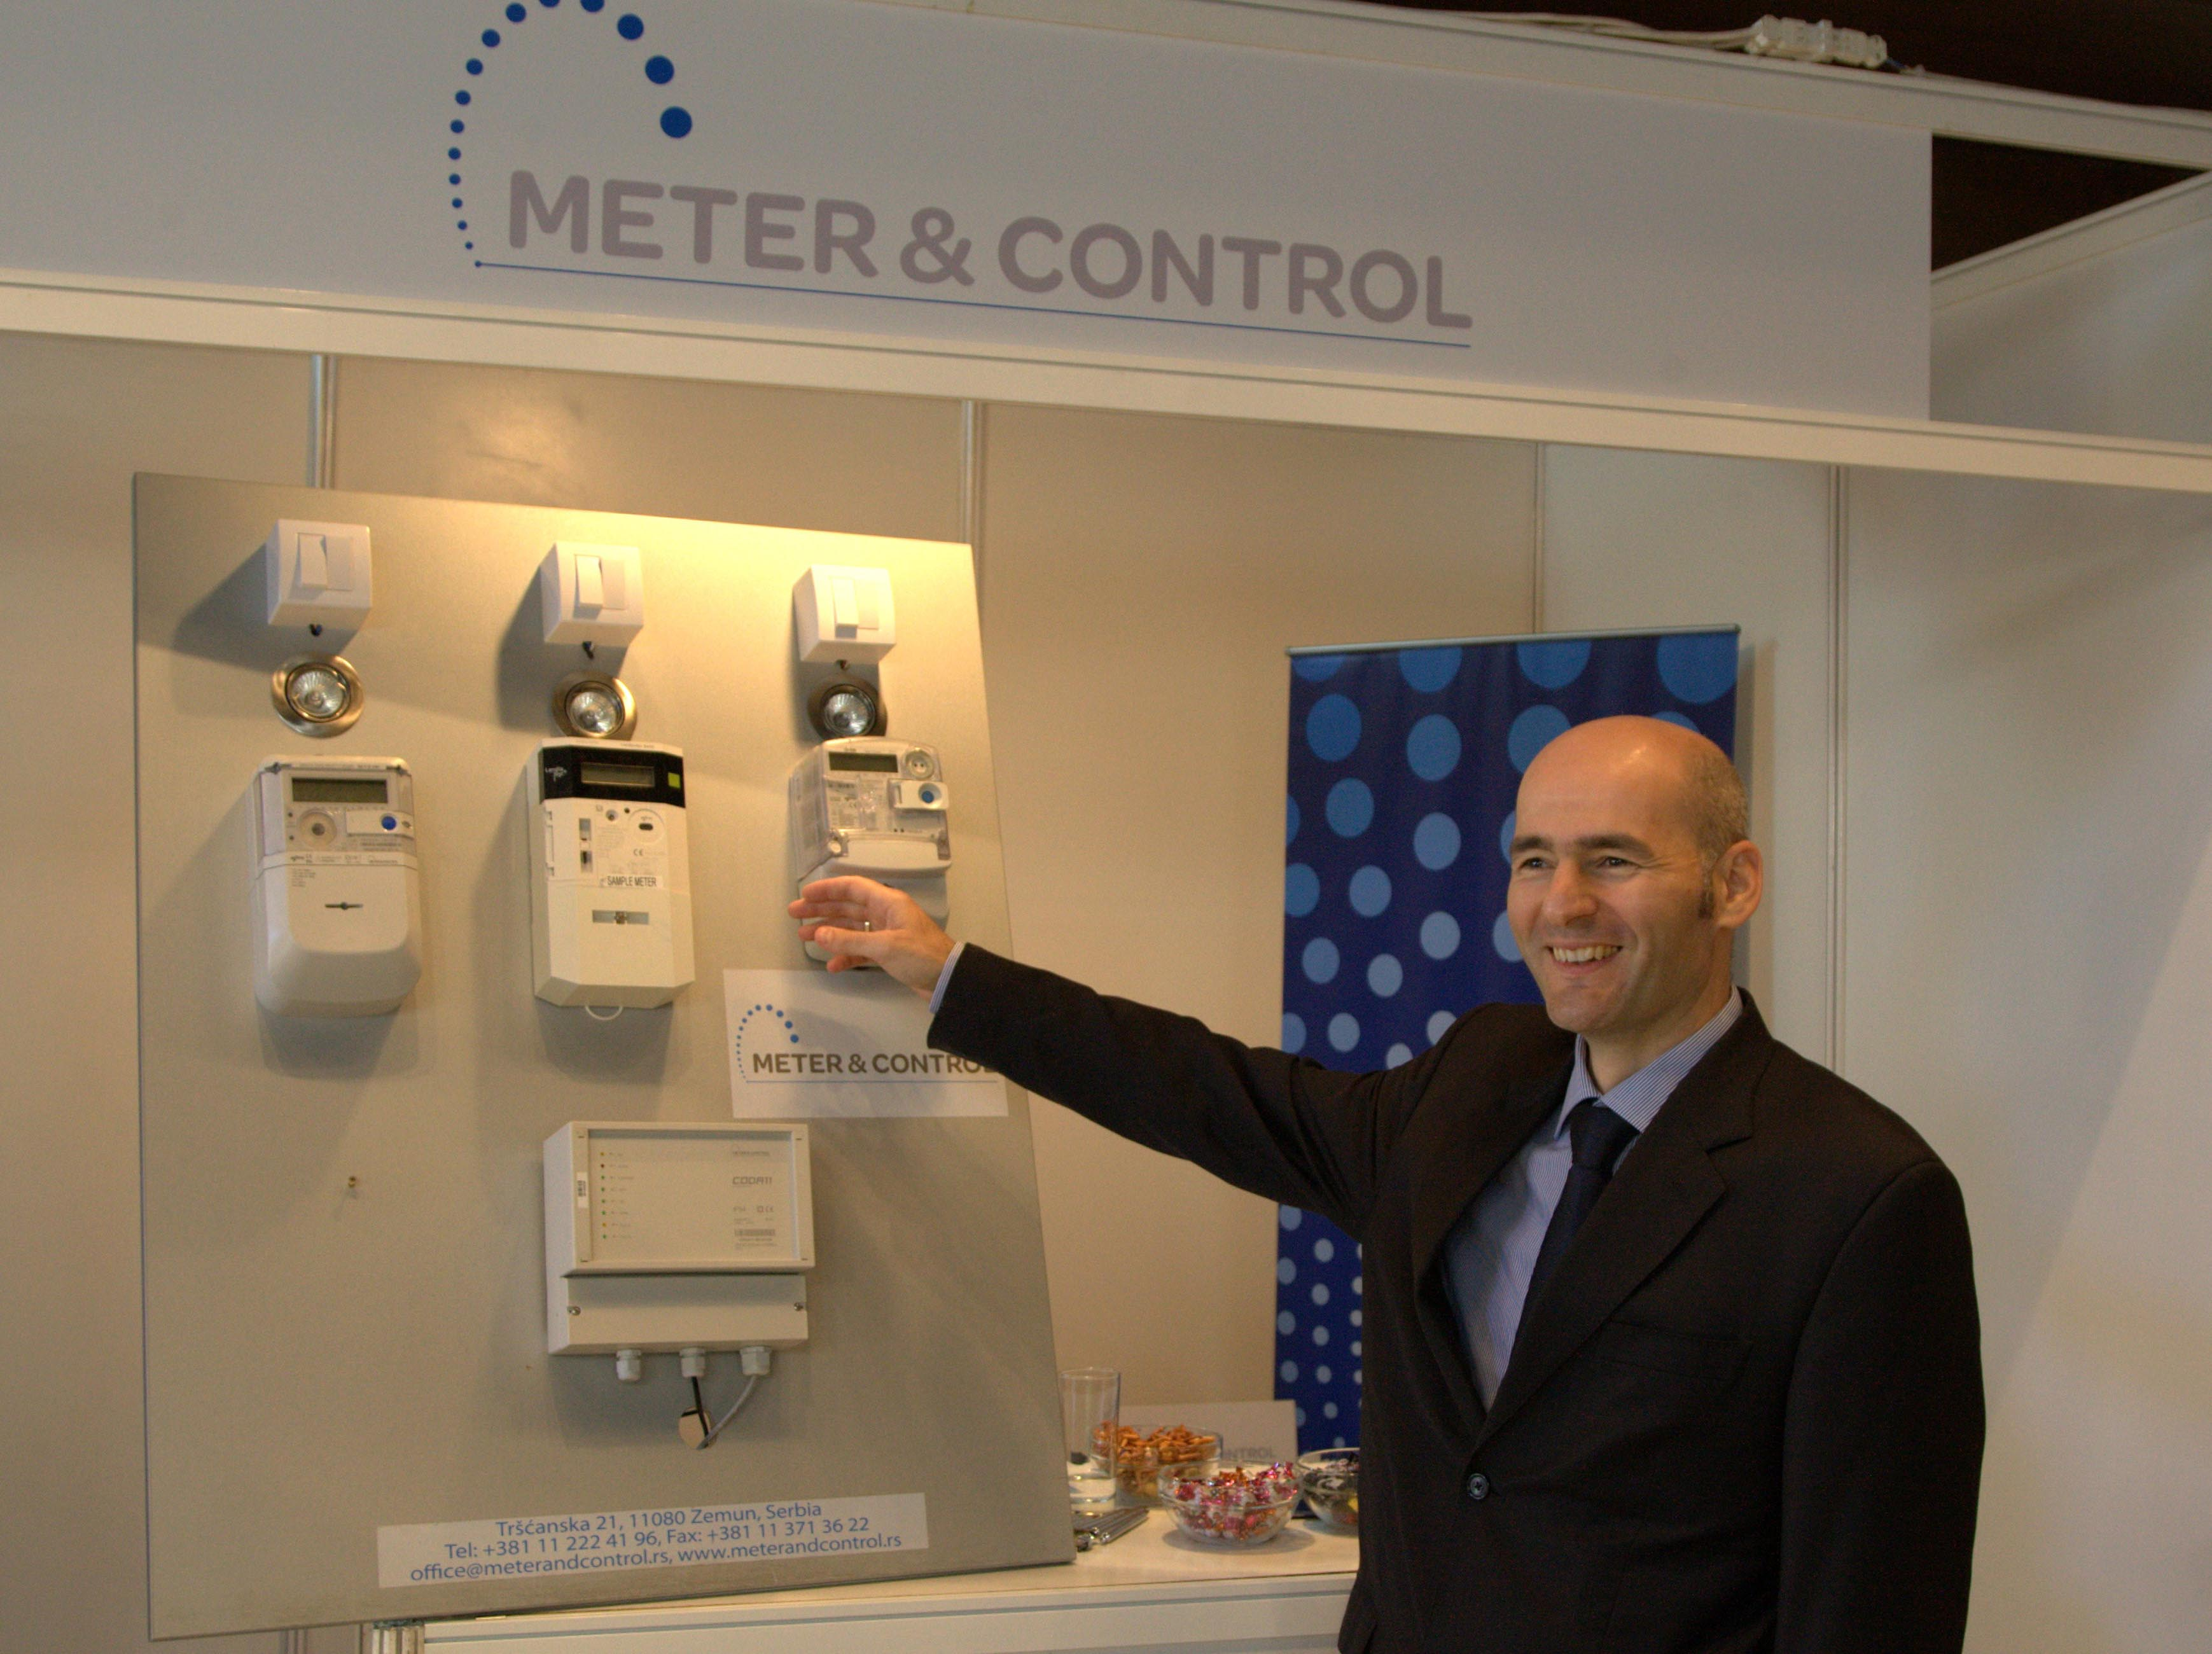 Kompanija Meter&Control predstavila je pametna brojila proizvedena prema svetskim standardima